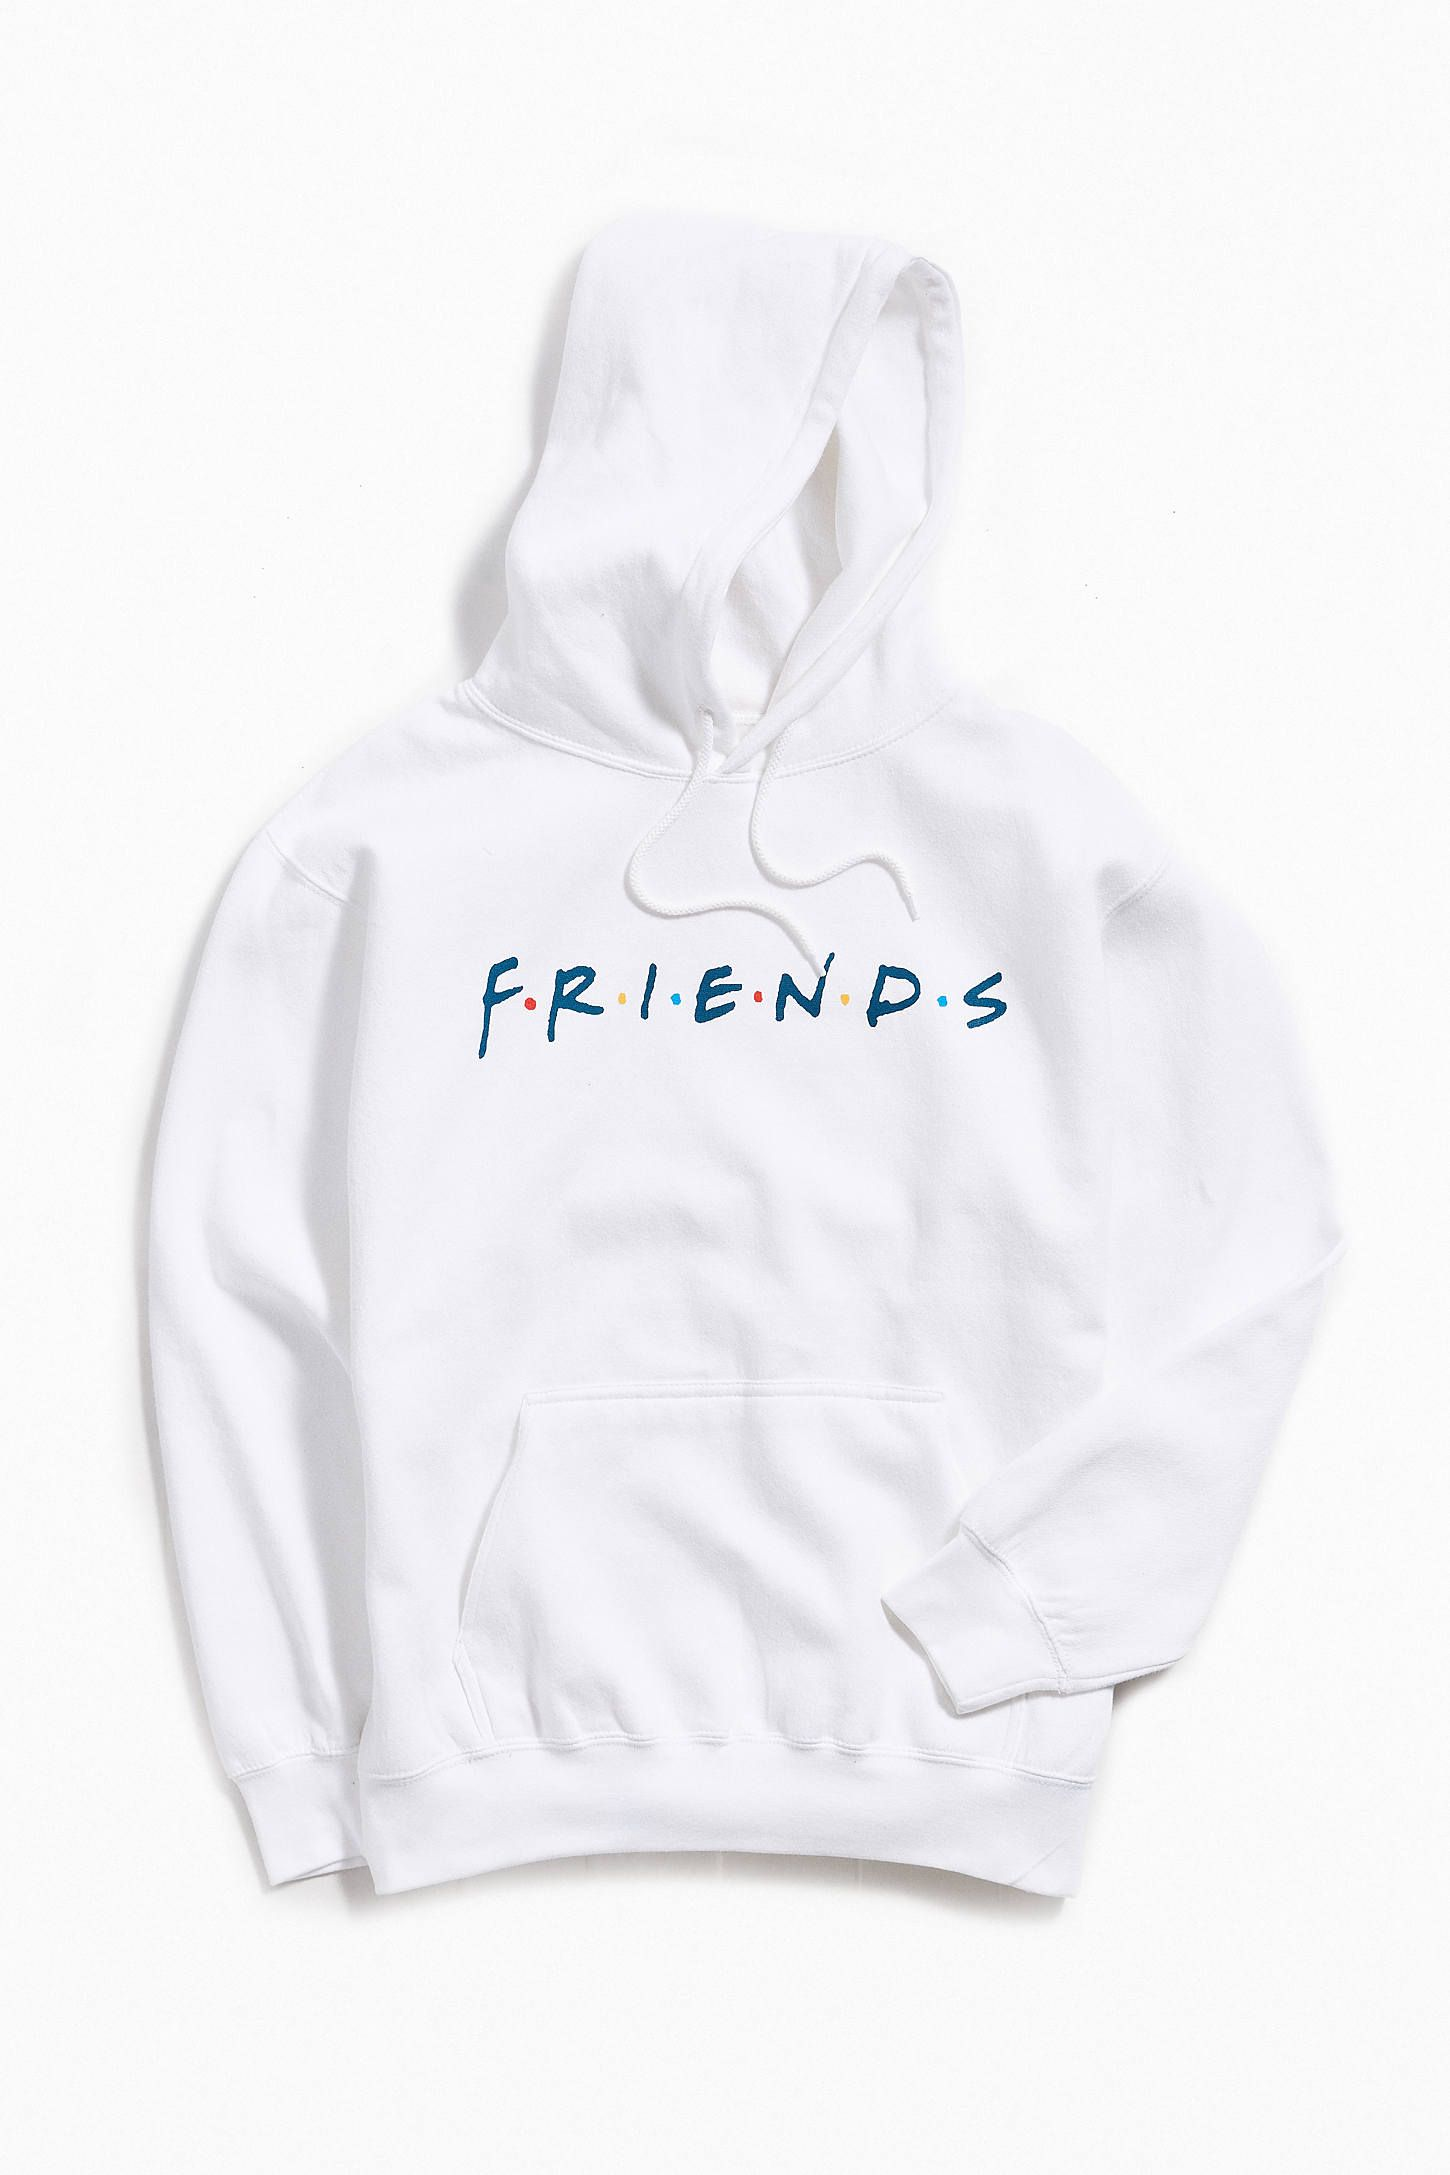 3834ab2b8c6 18 Best 'Friends' TV Show Gift Ideas for 2018 - Top Friends Merchandise